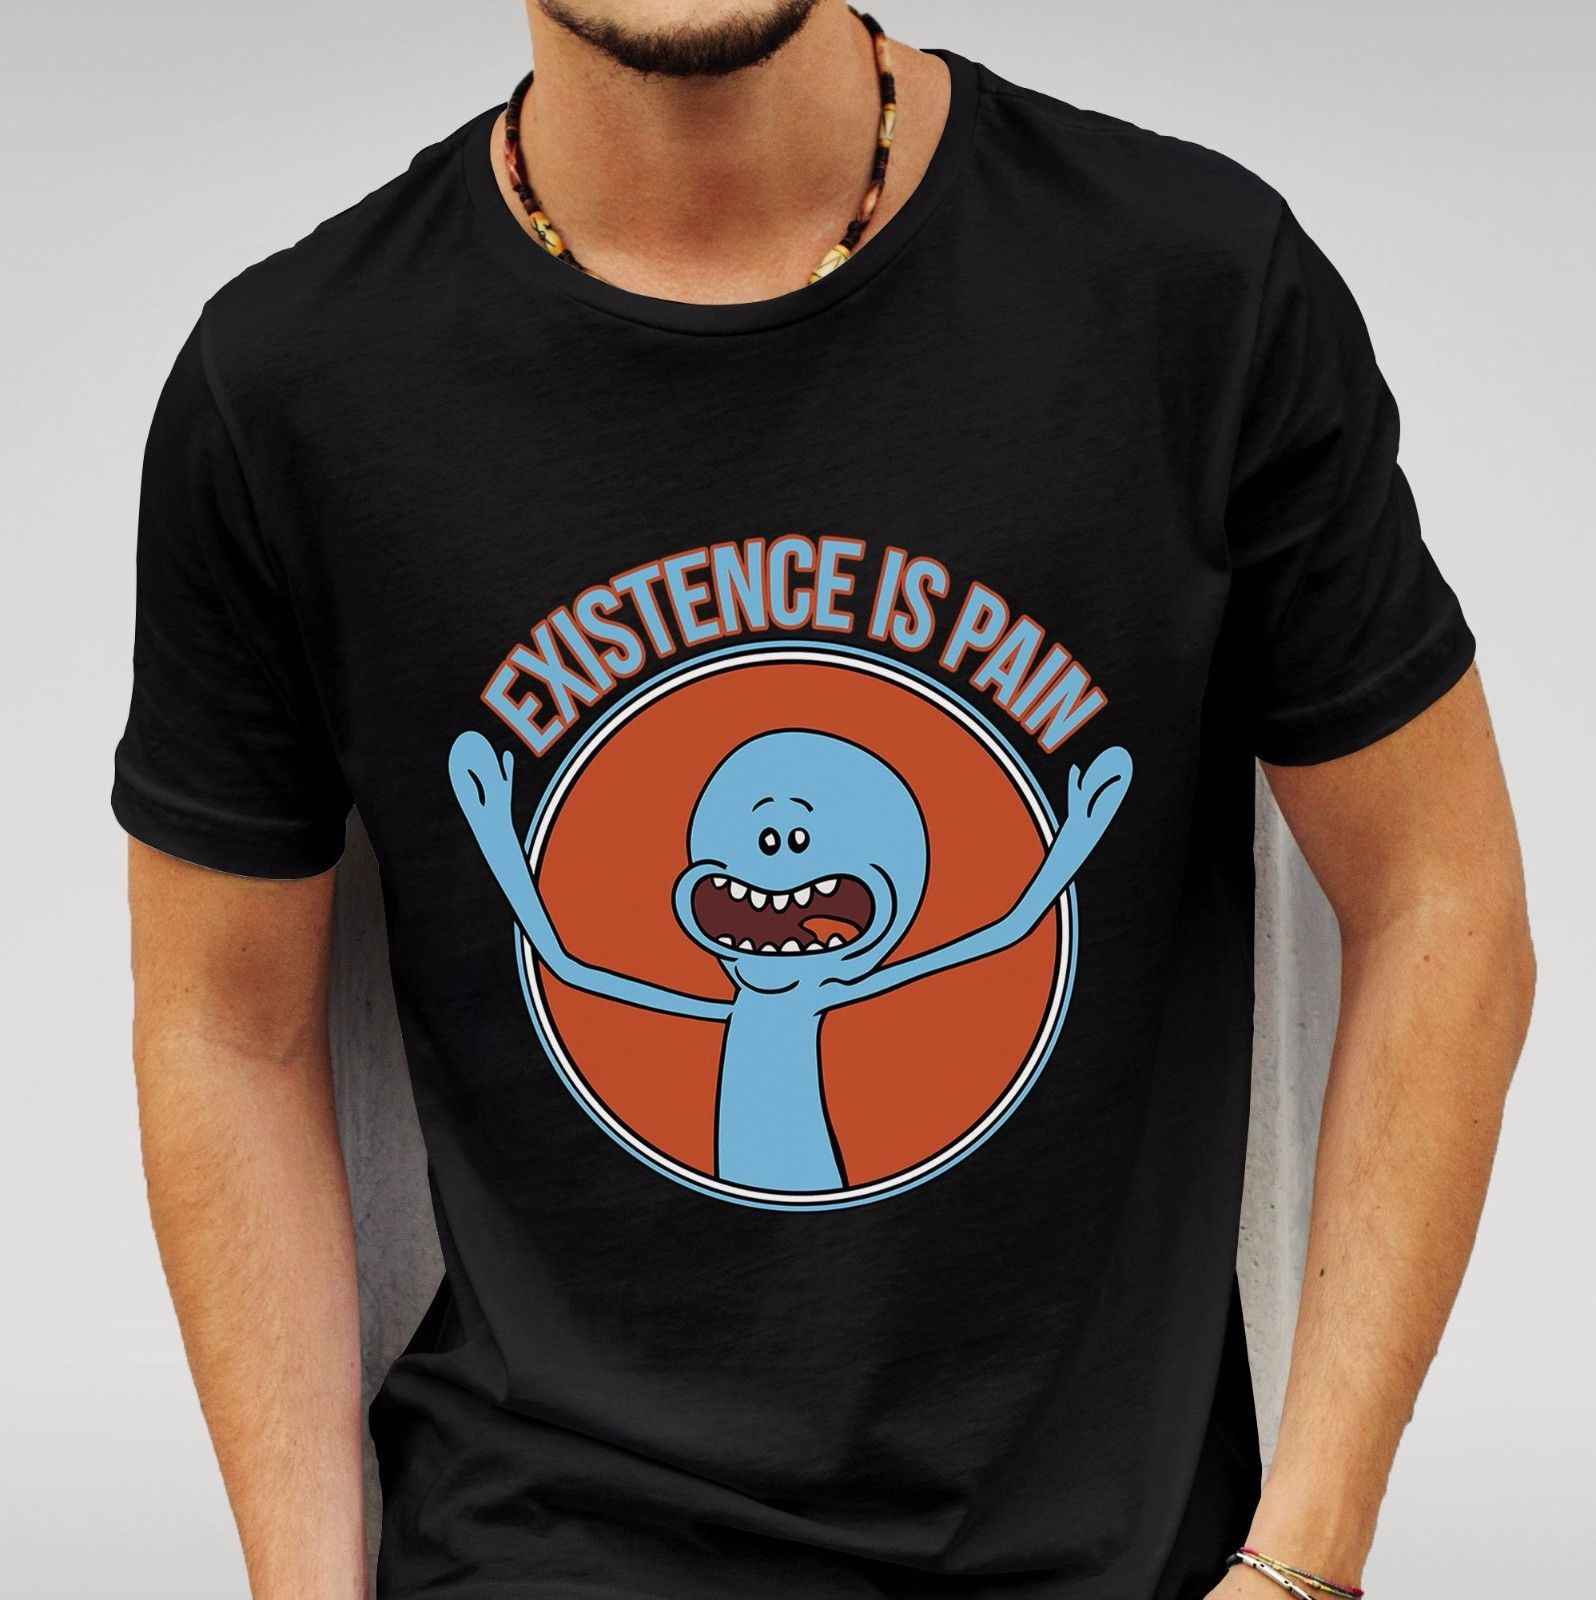 Ri en Morty Mr Meeseeks Bestaan is Pijn Bla Tshirt Mens Womens Unisex Gratis verzending Harajuku Tops t-shirt Fashion classic